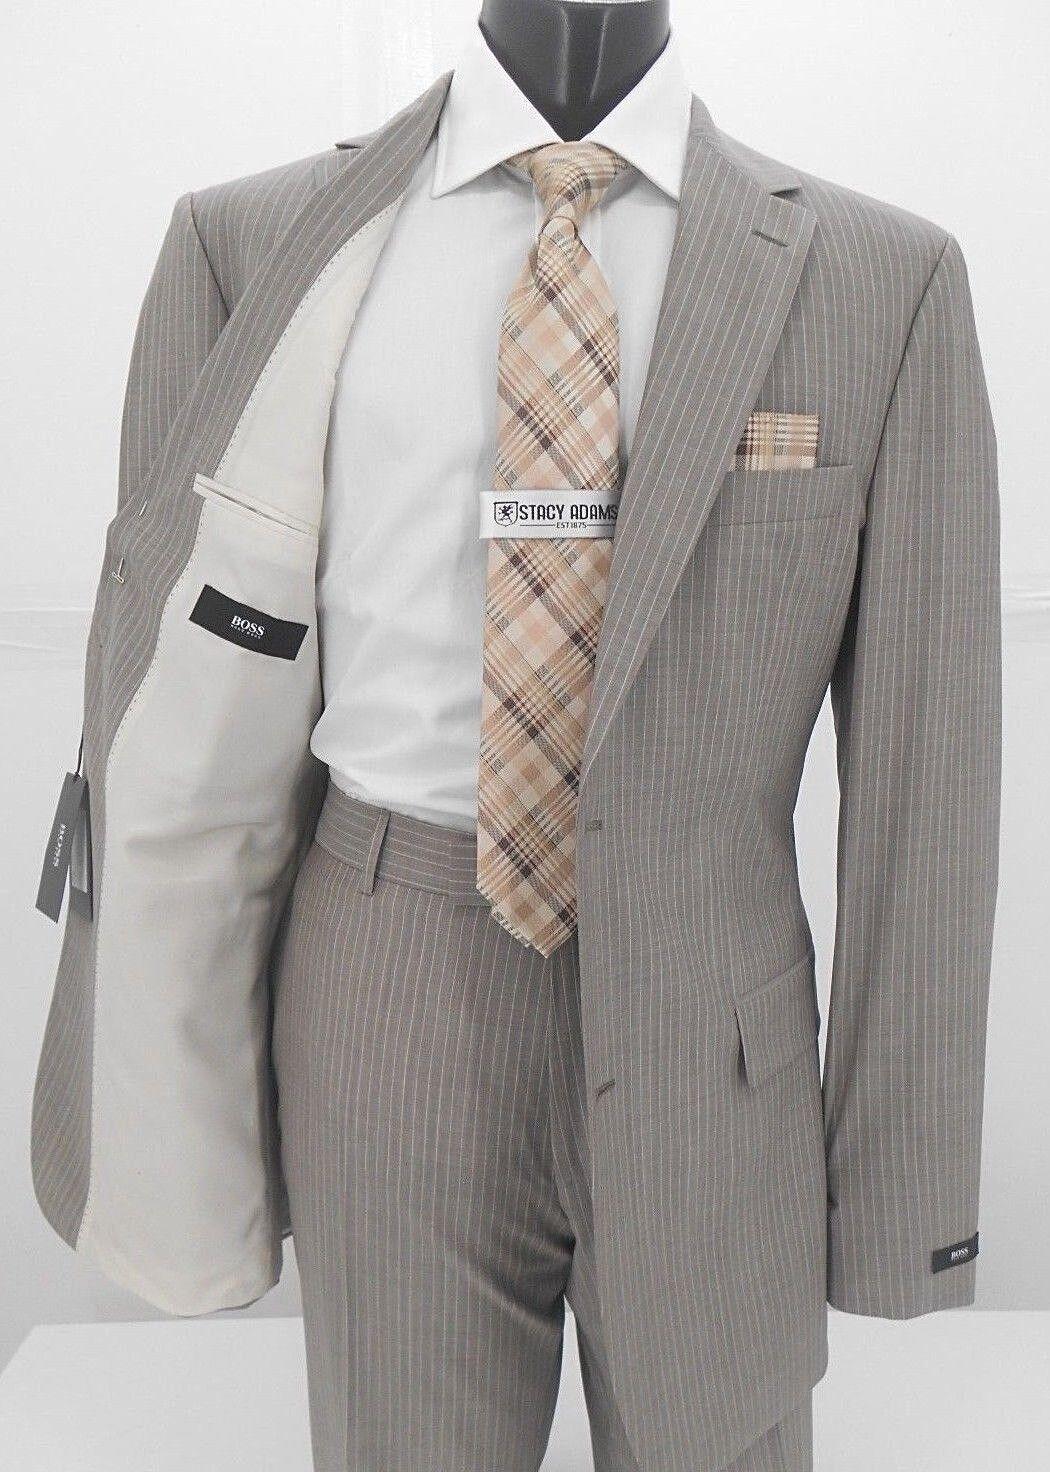 Hugo Boss Tan Stripe 2B Super 100 All Wool  Herren Classic Fit Suit 299.99